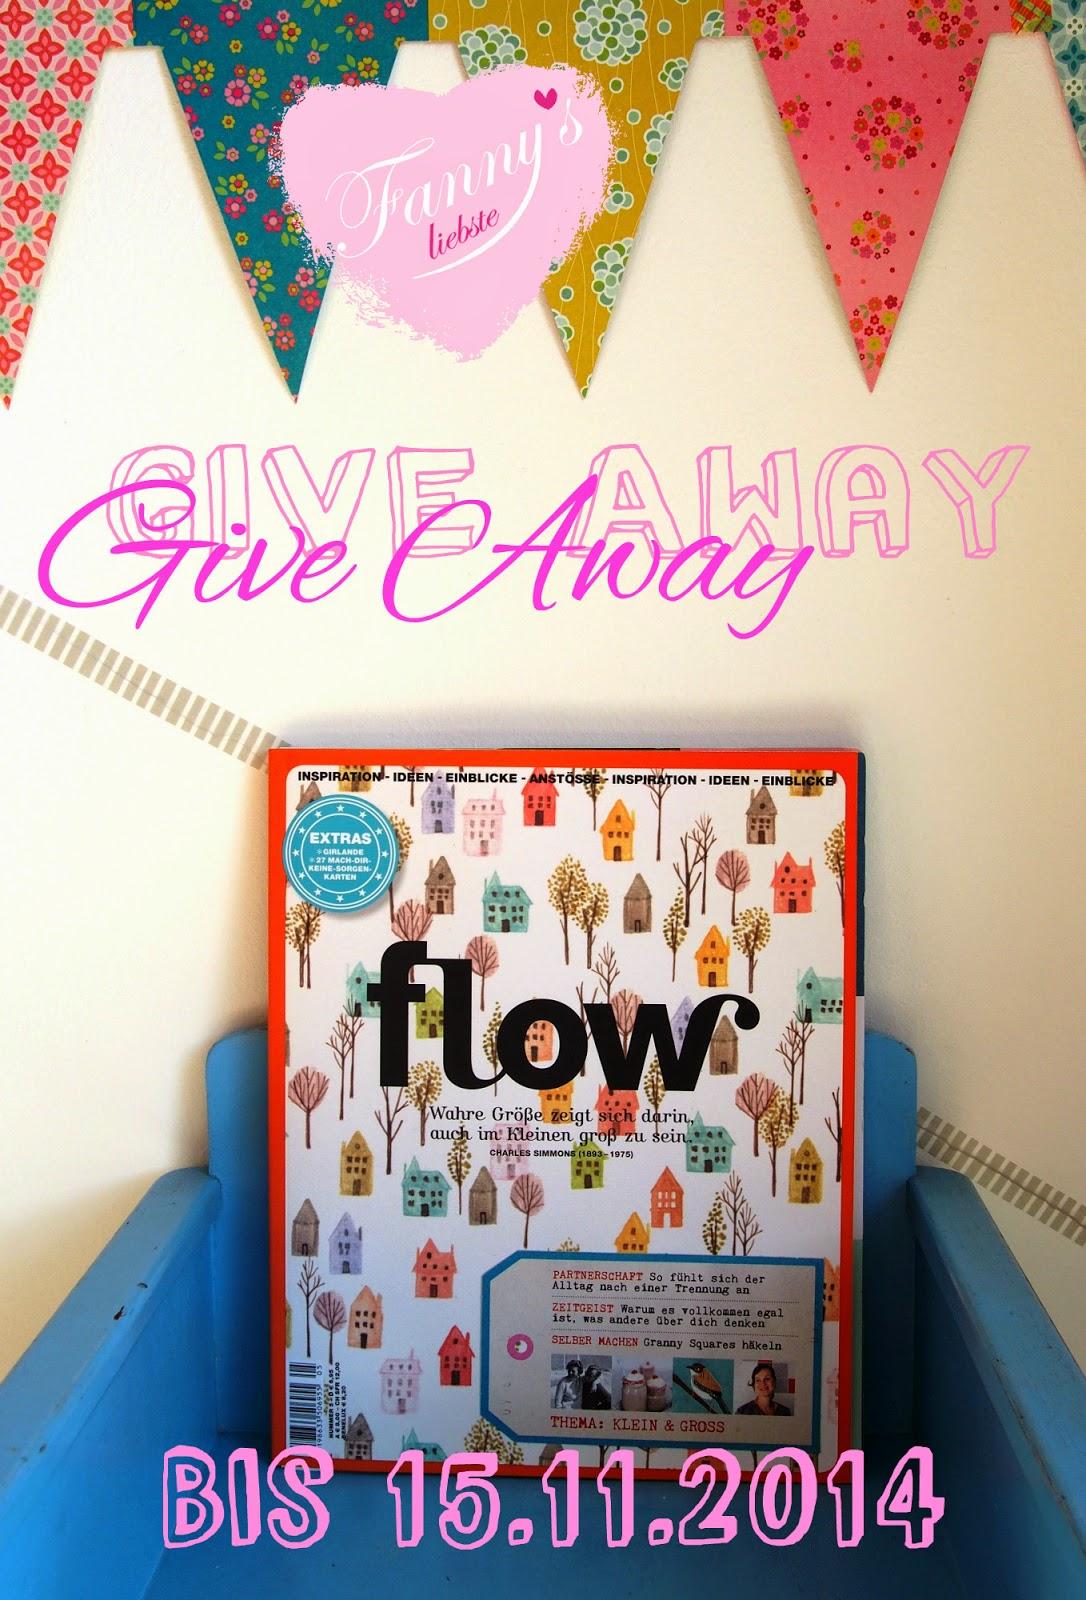 Give Away bei Fanny (Fannys liebste)